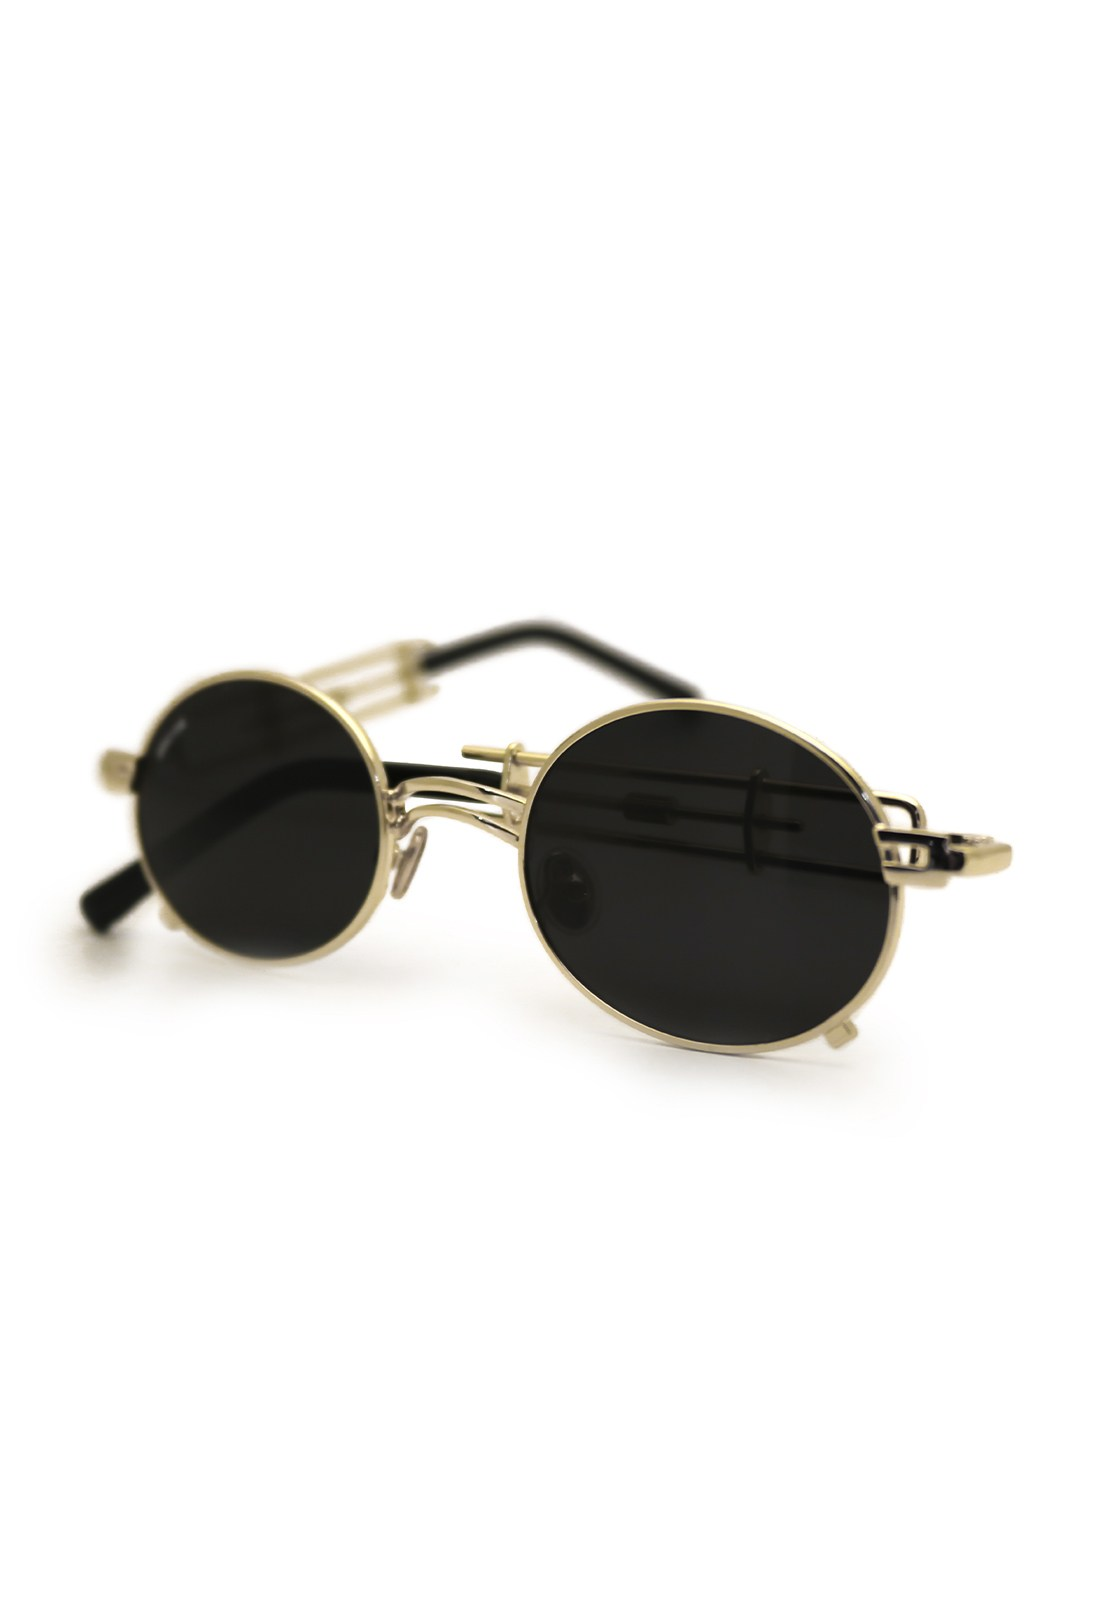 Óculos de Sol Grungetteria Smith Dourado